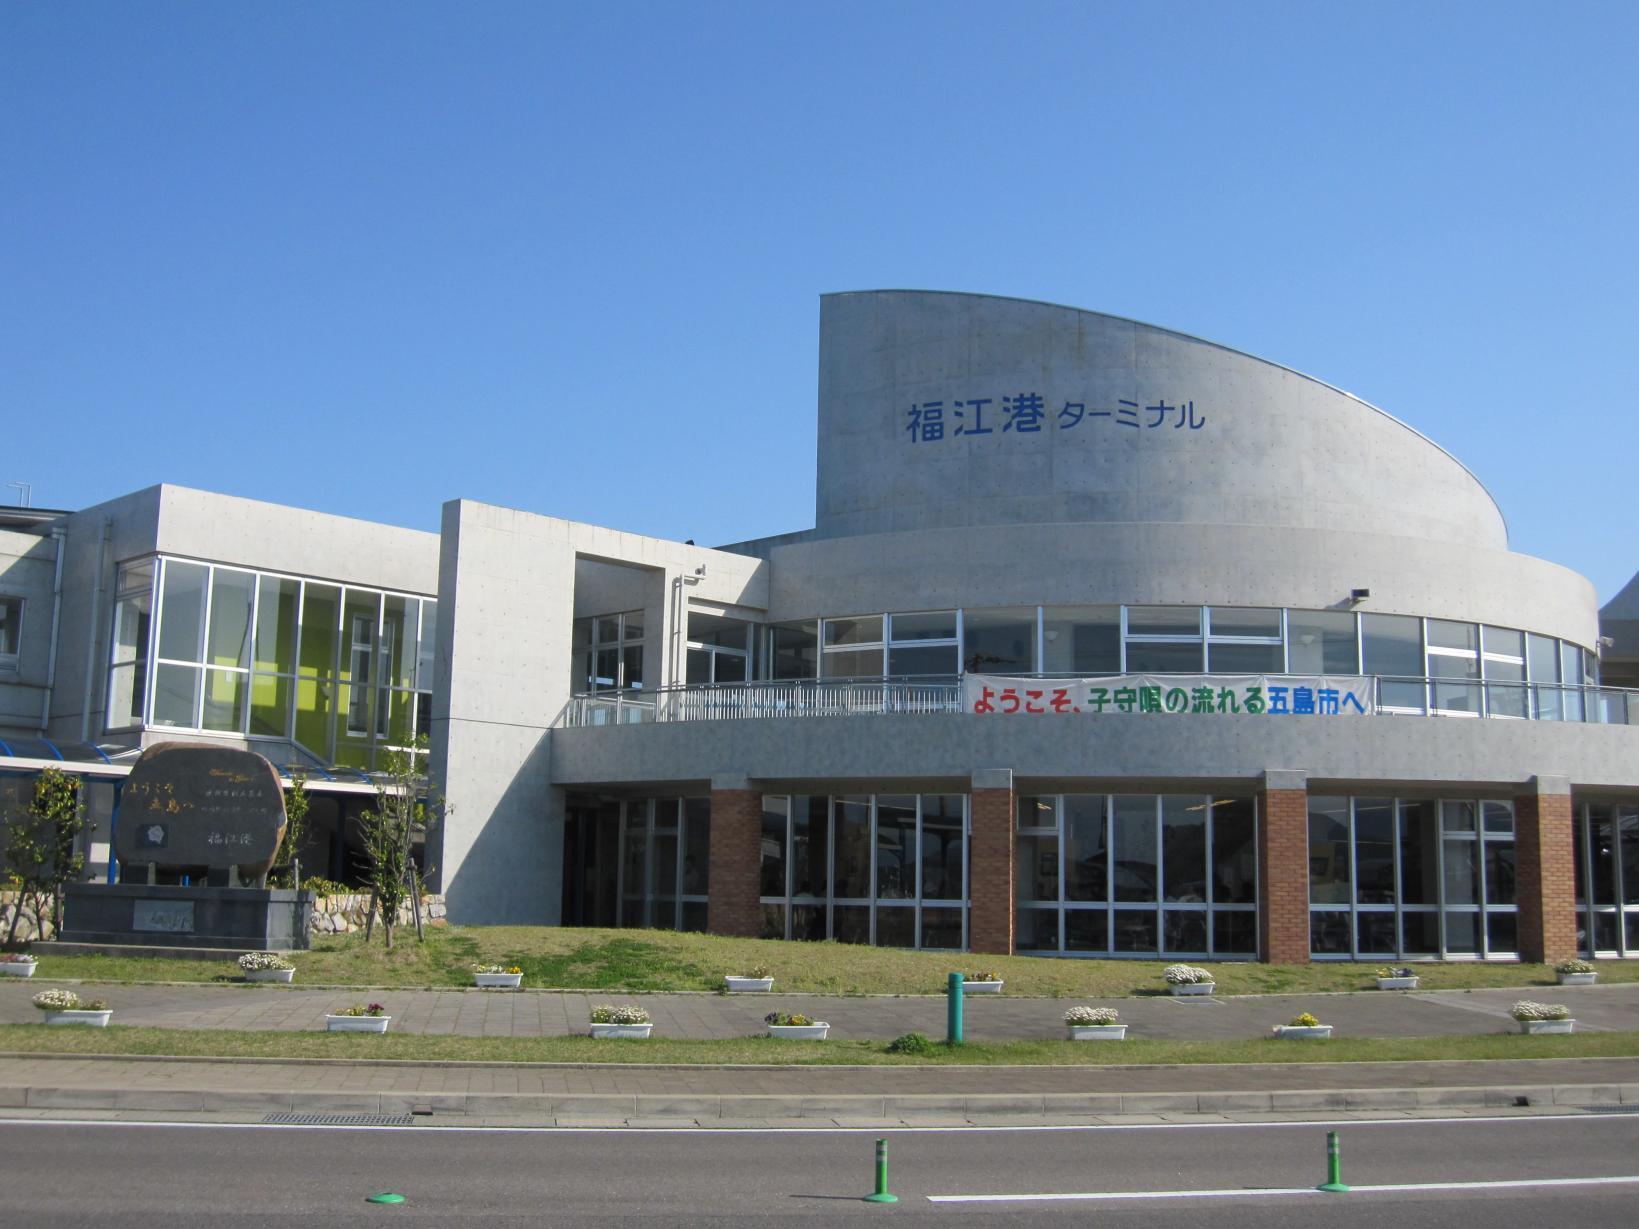 【Day 1】Fukue Port-1